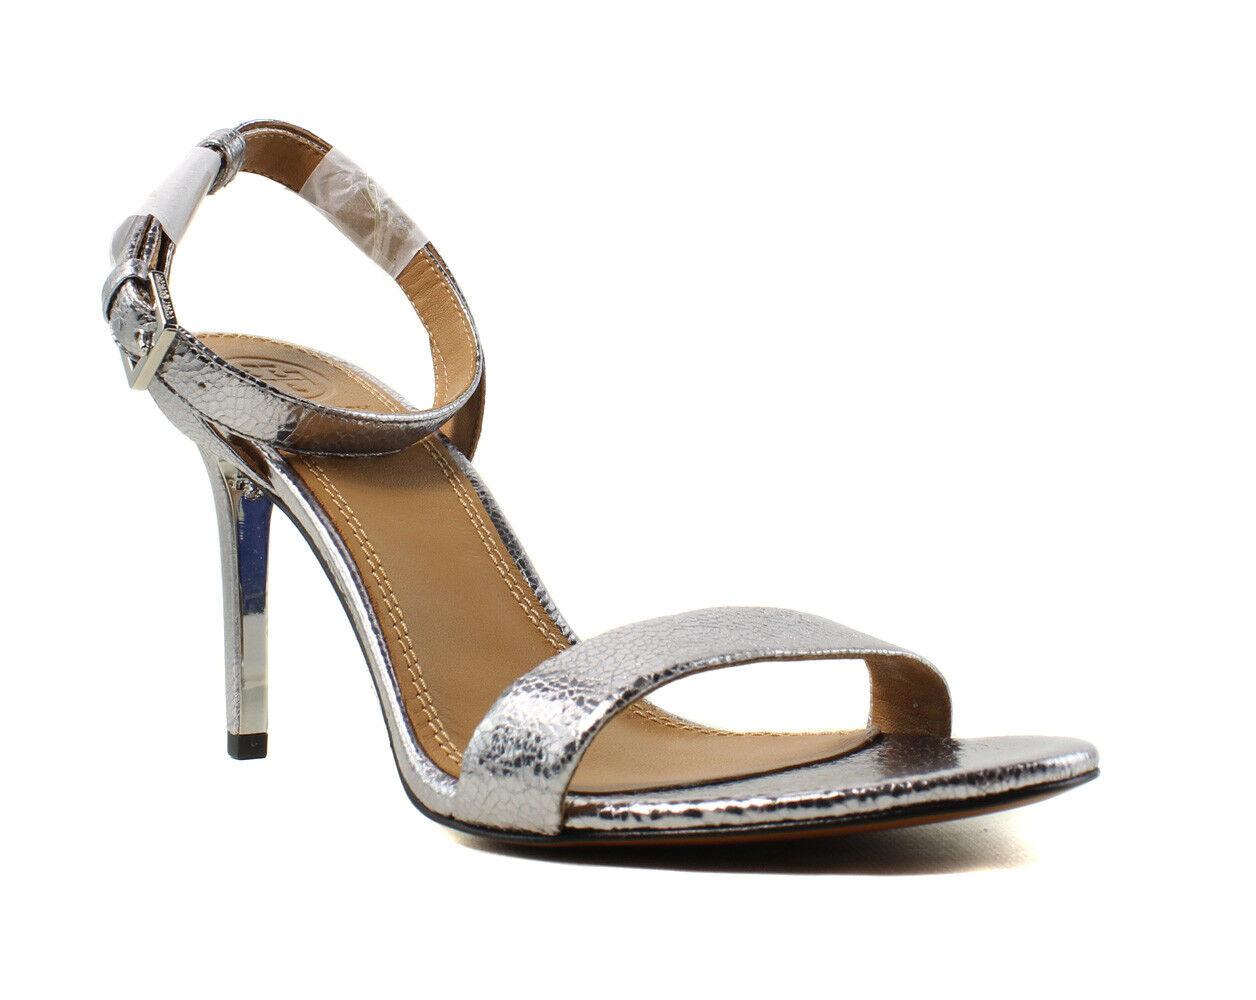 NEU Tory Burch Damenschuhe Silver Ankle Strap Heels Größe 11